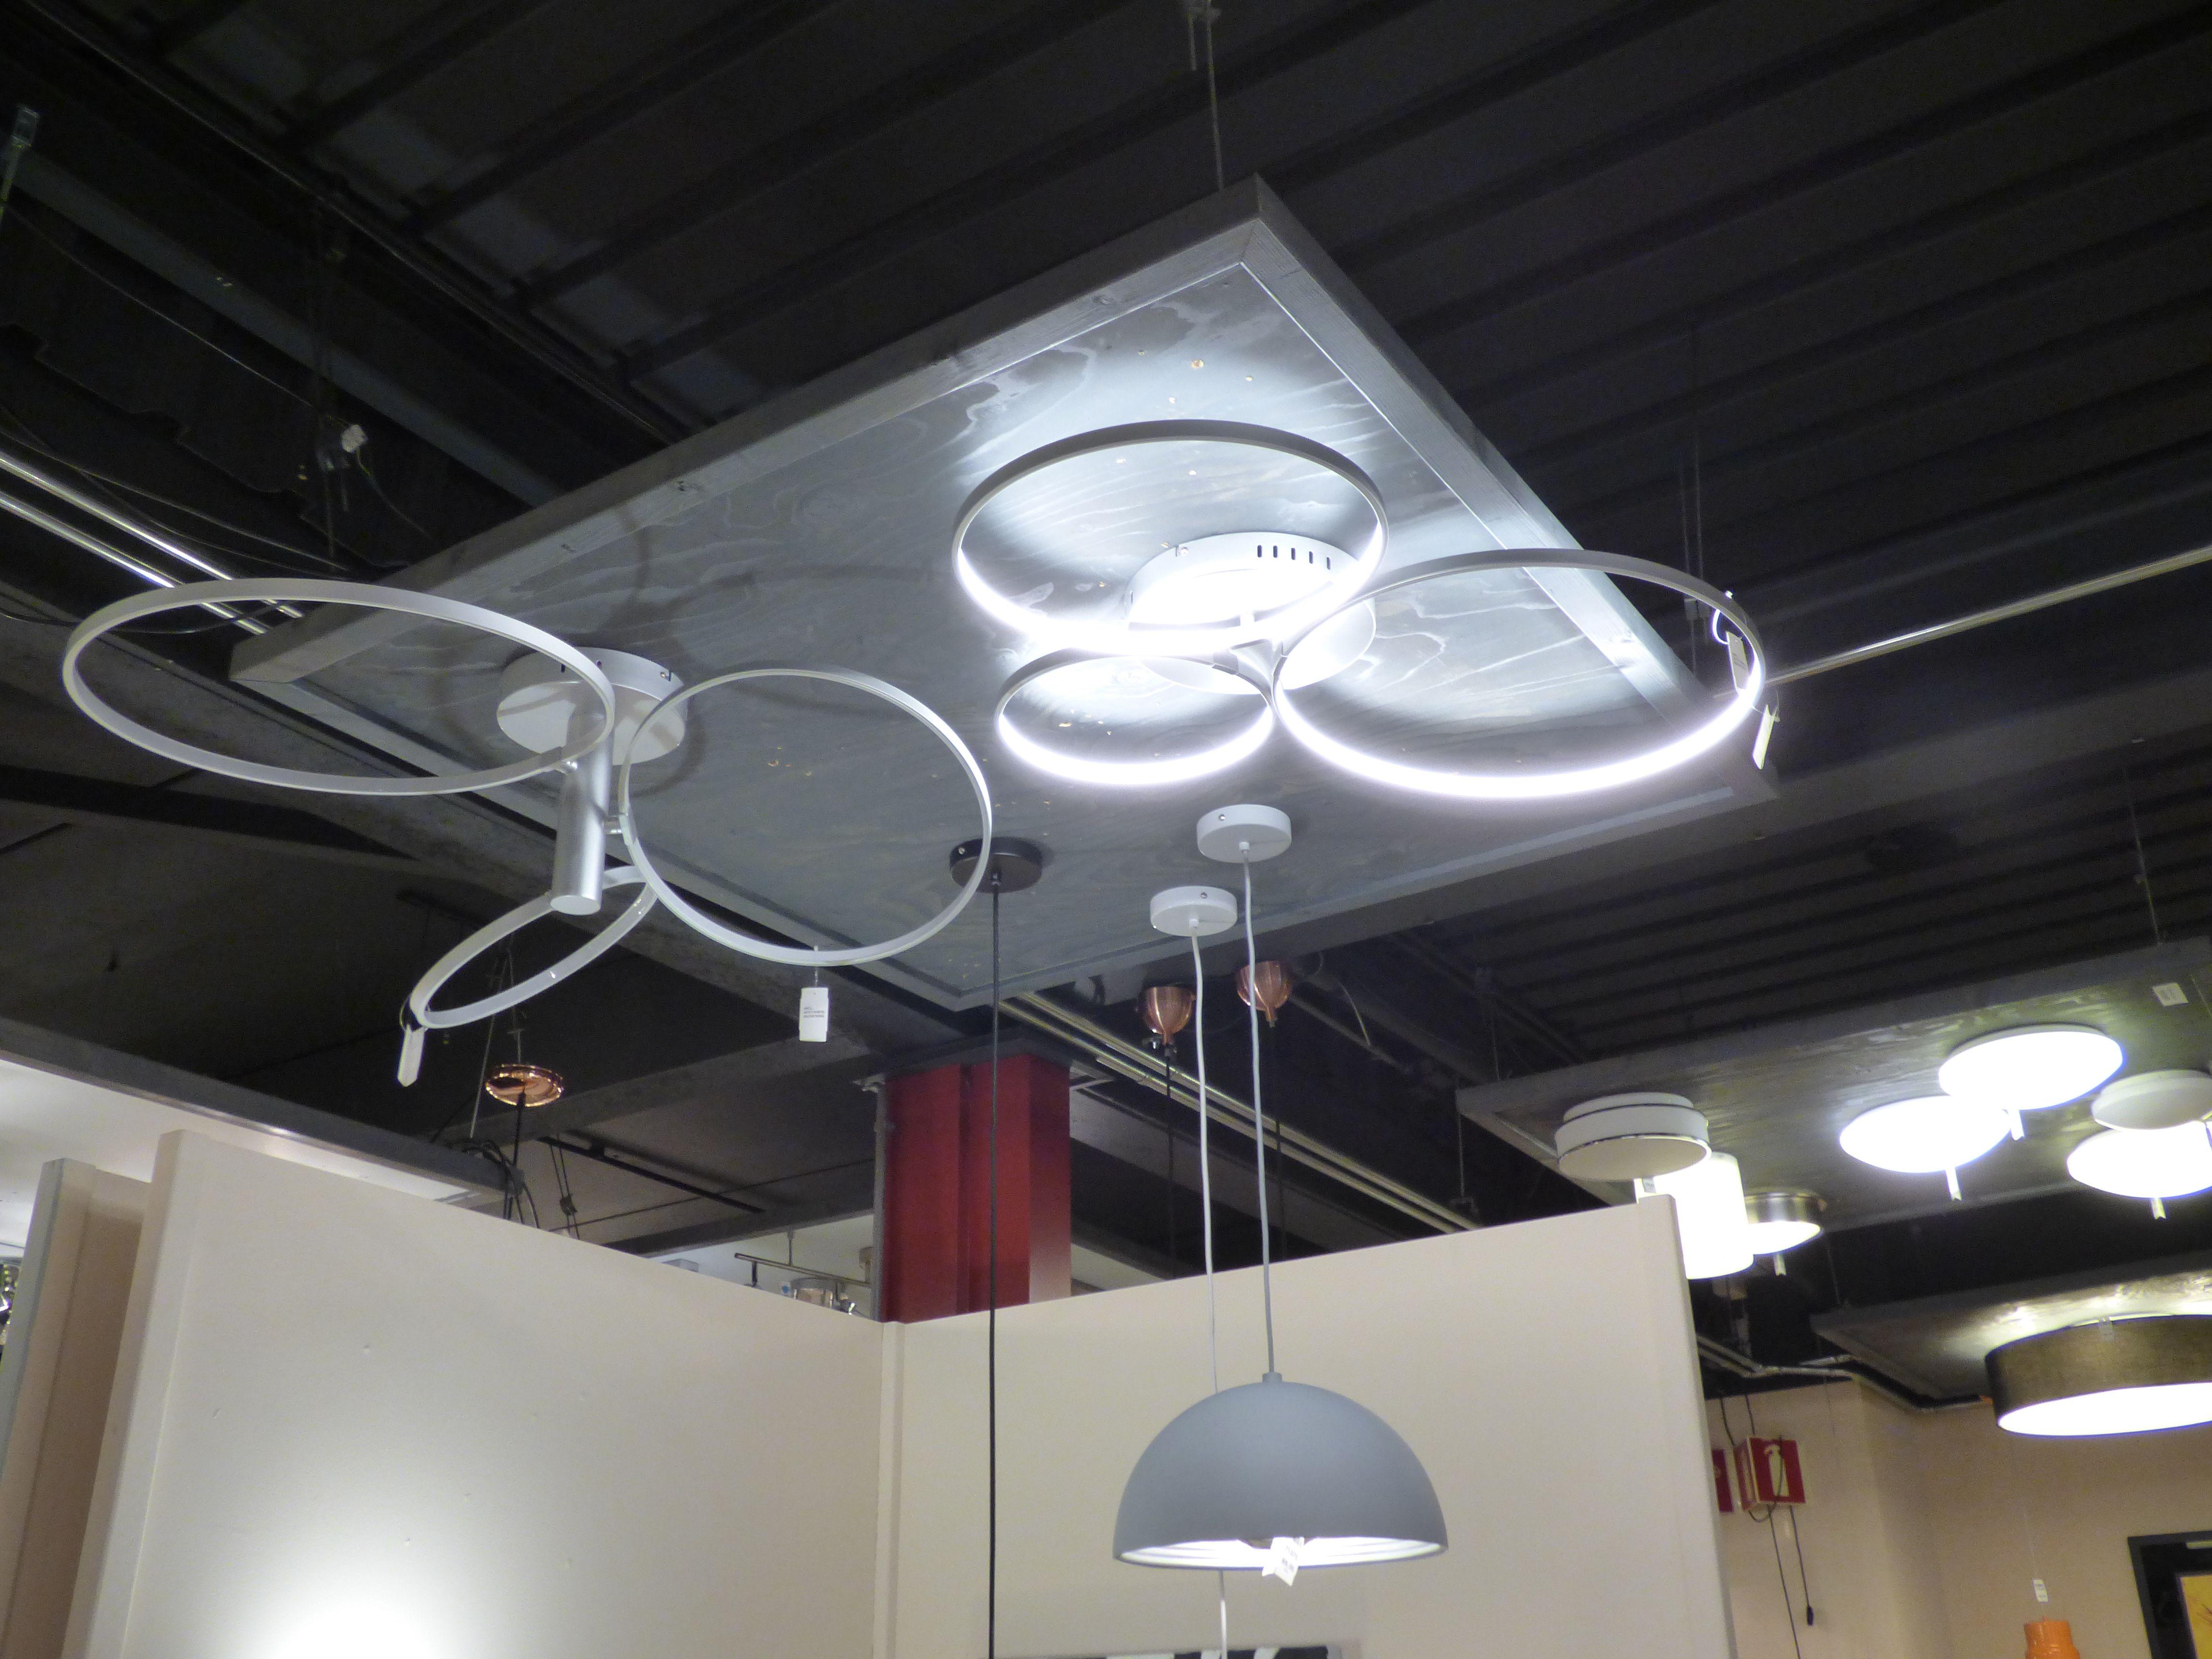 Iluminaci n showroom tienda interior l mparas - Focos iluminacion interior ...